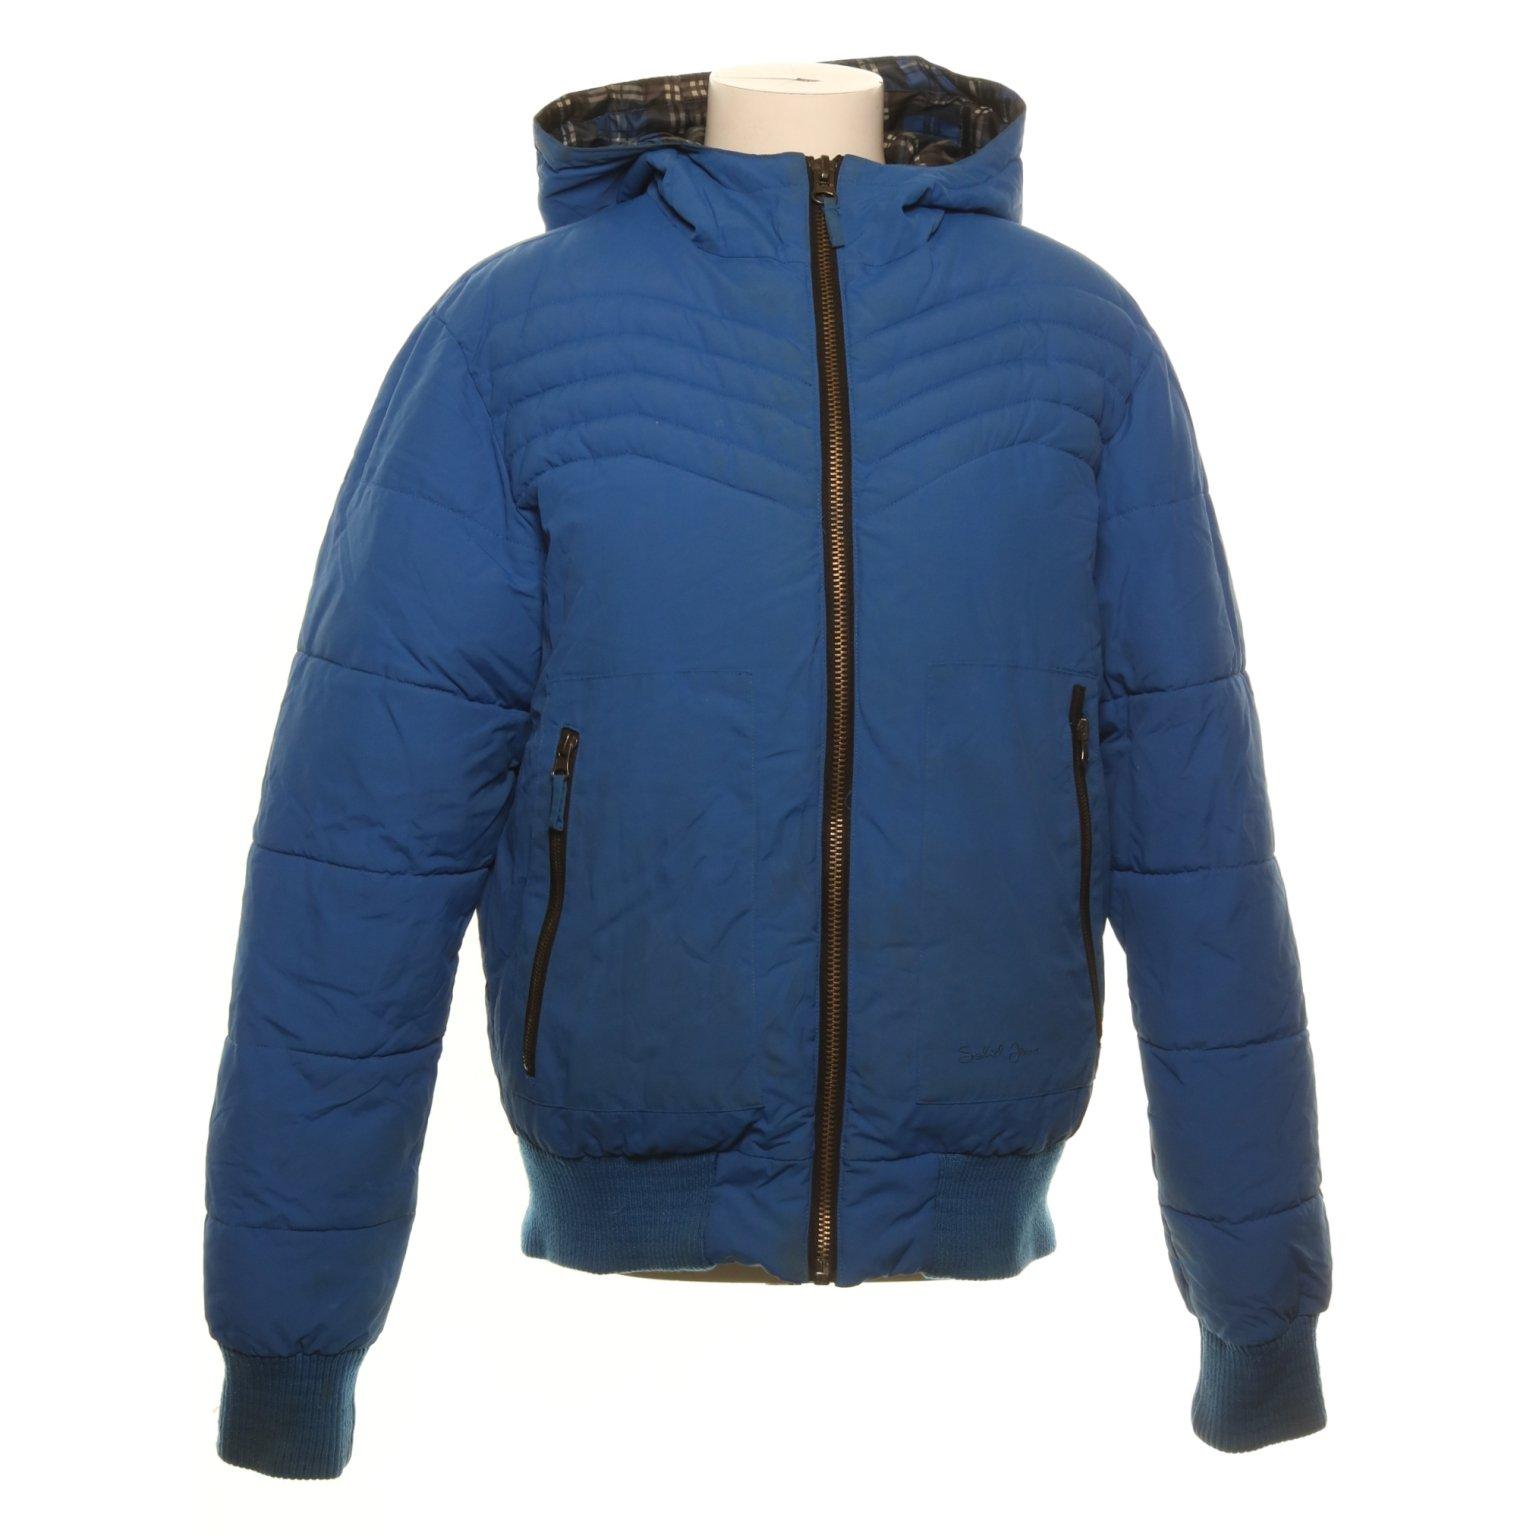 Solid Jeans, Vinterjacka, Strl: M, Blå, N.. (408351480) ᐈ